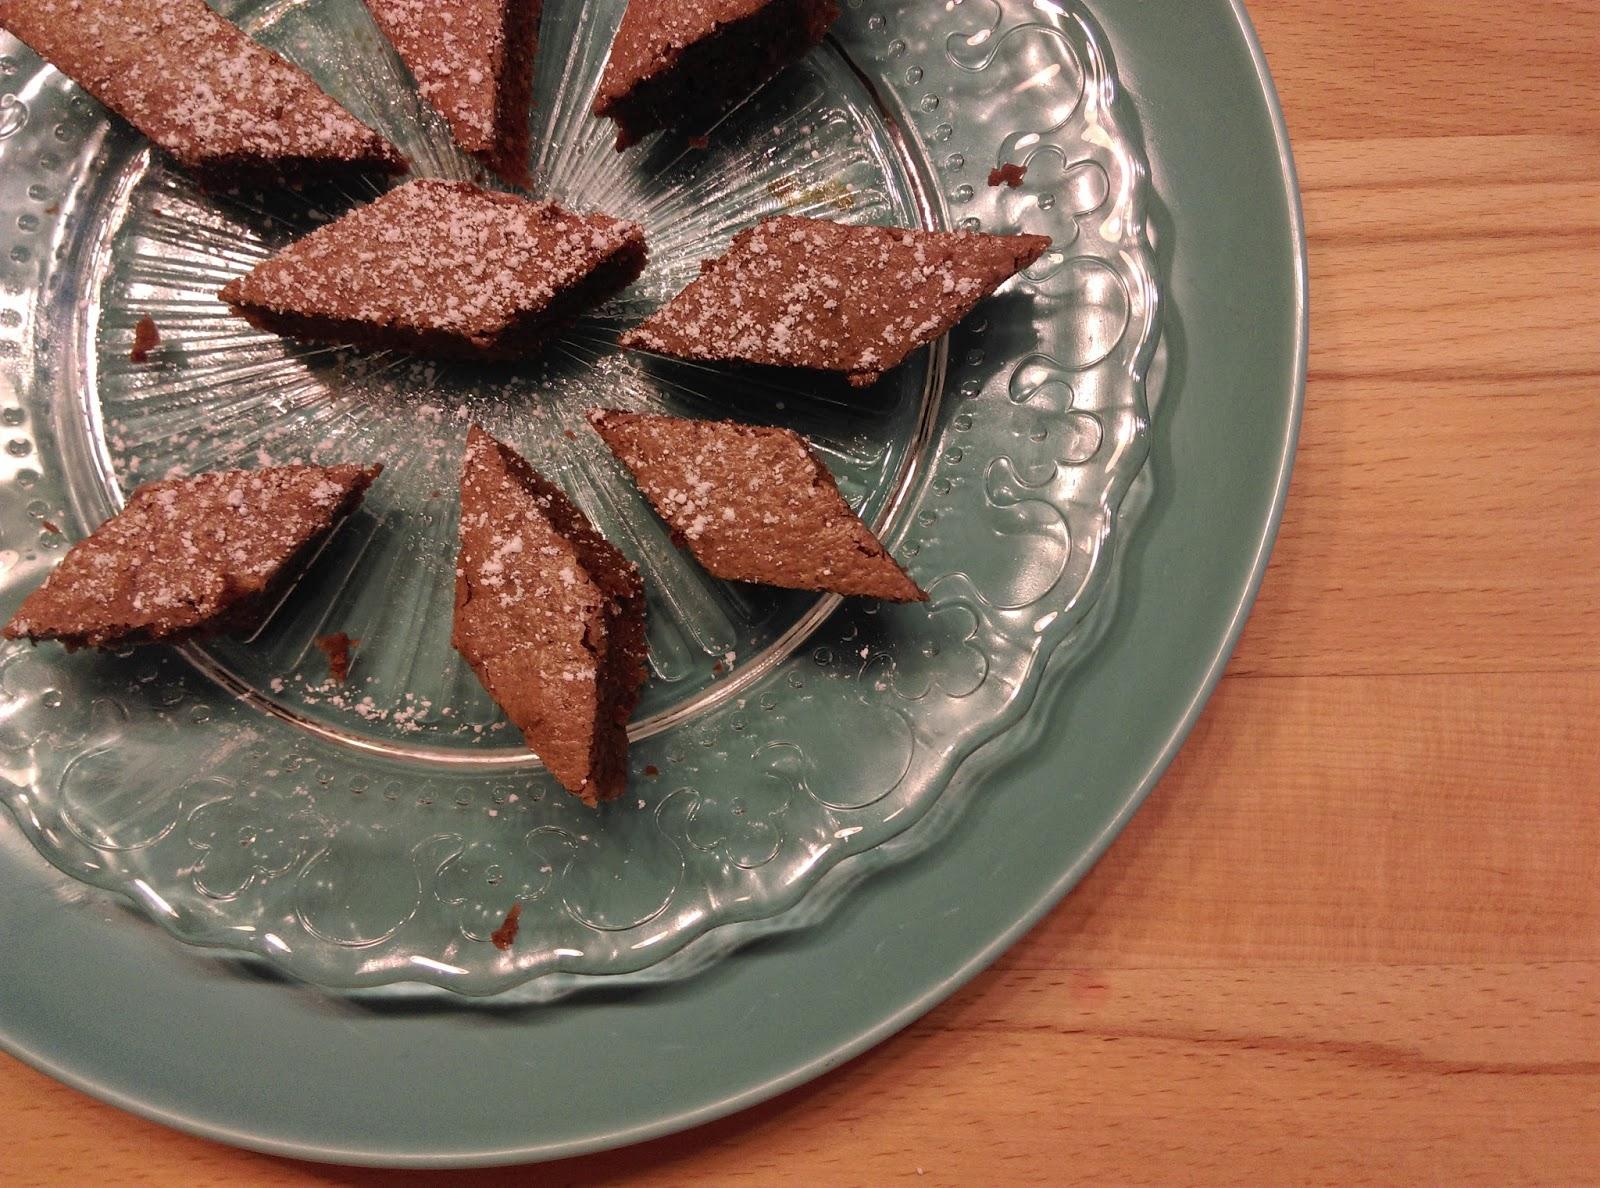 Schokoladenbrot Weihnachten.Birgit Schreibt Schokoladenbrot